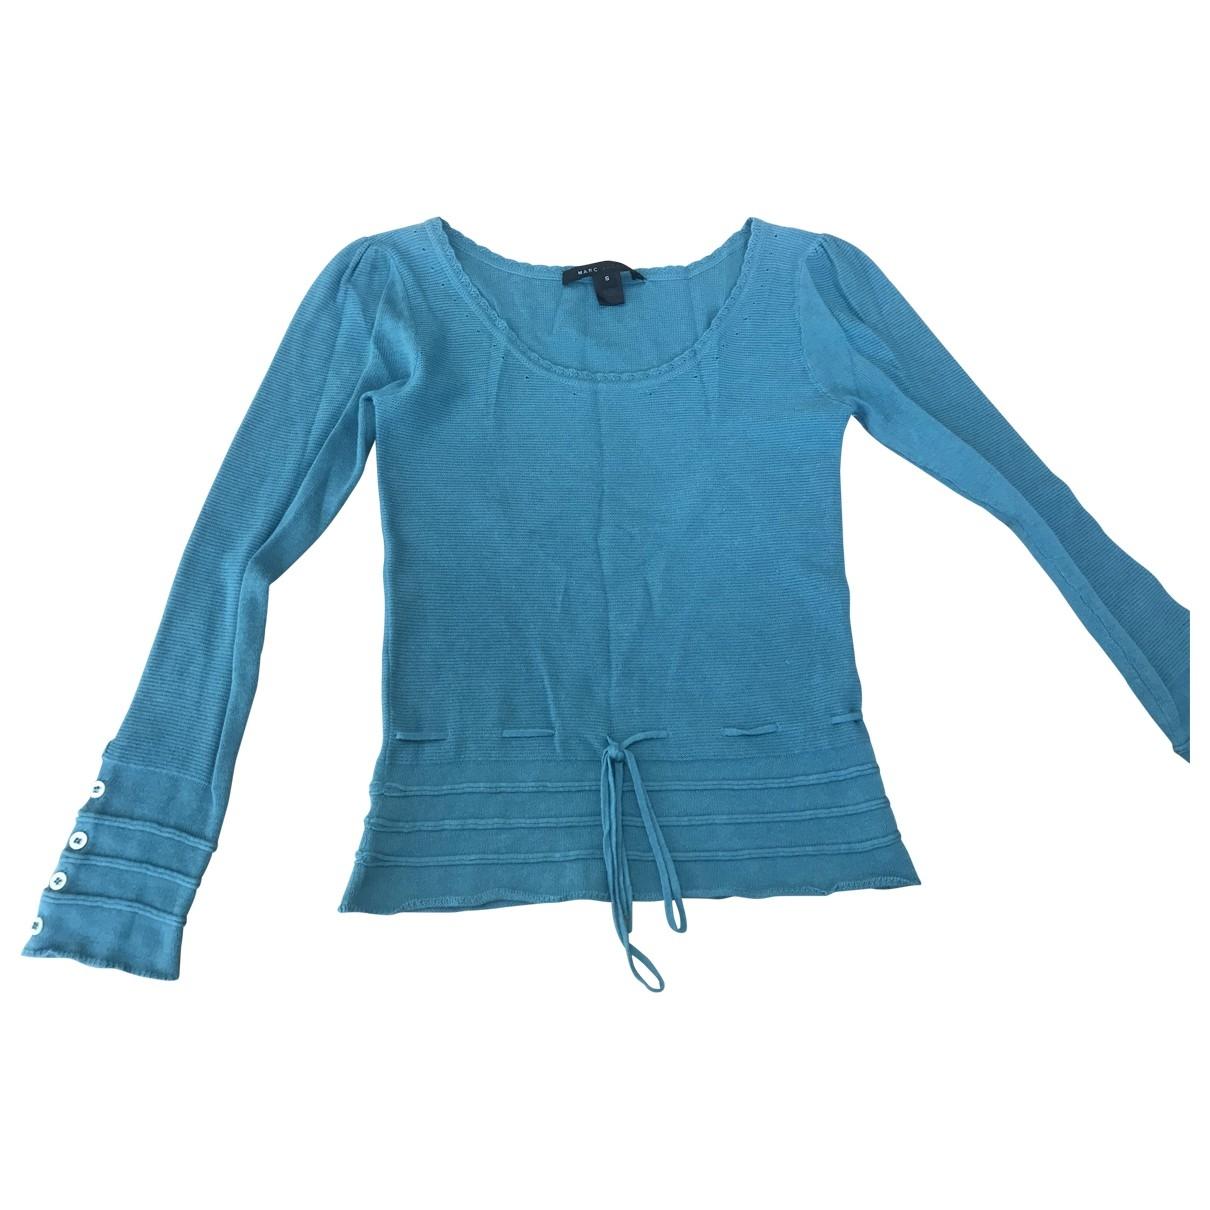 Marc By Marc Jacobs - Pull   pour femme en laine - turquoise